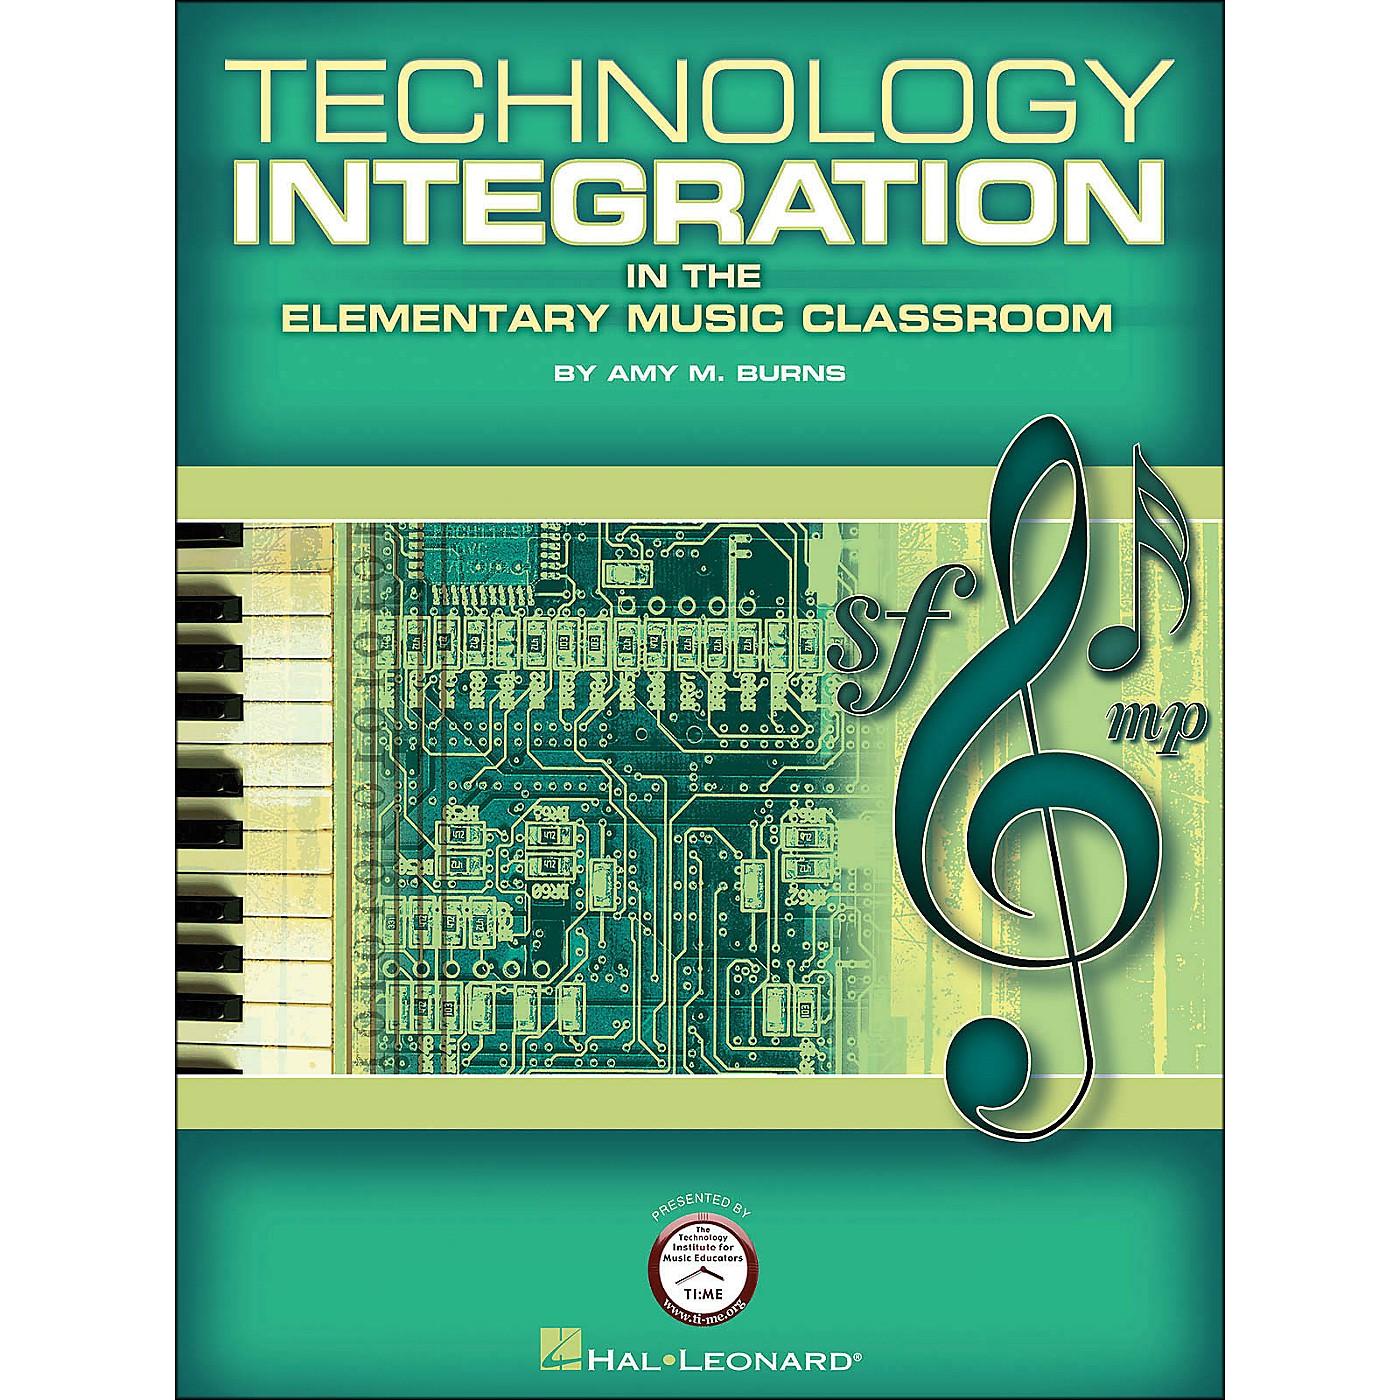 Hal Leonard Technology Integration In The Elementary Music Classroom thumbnail